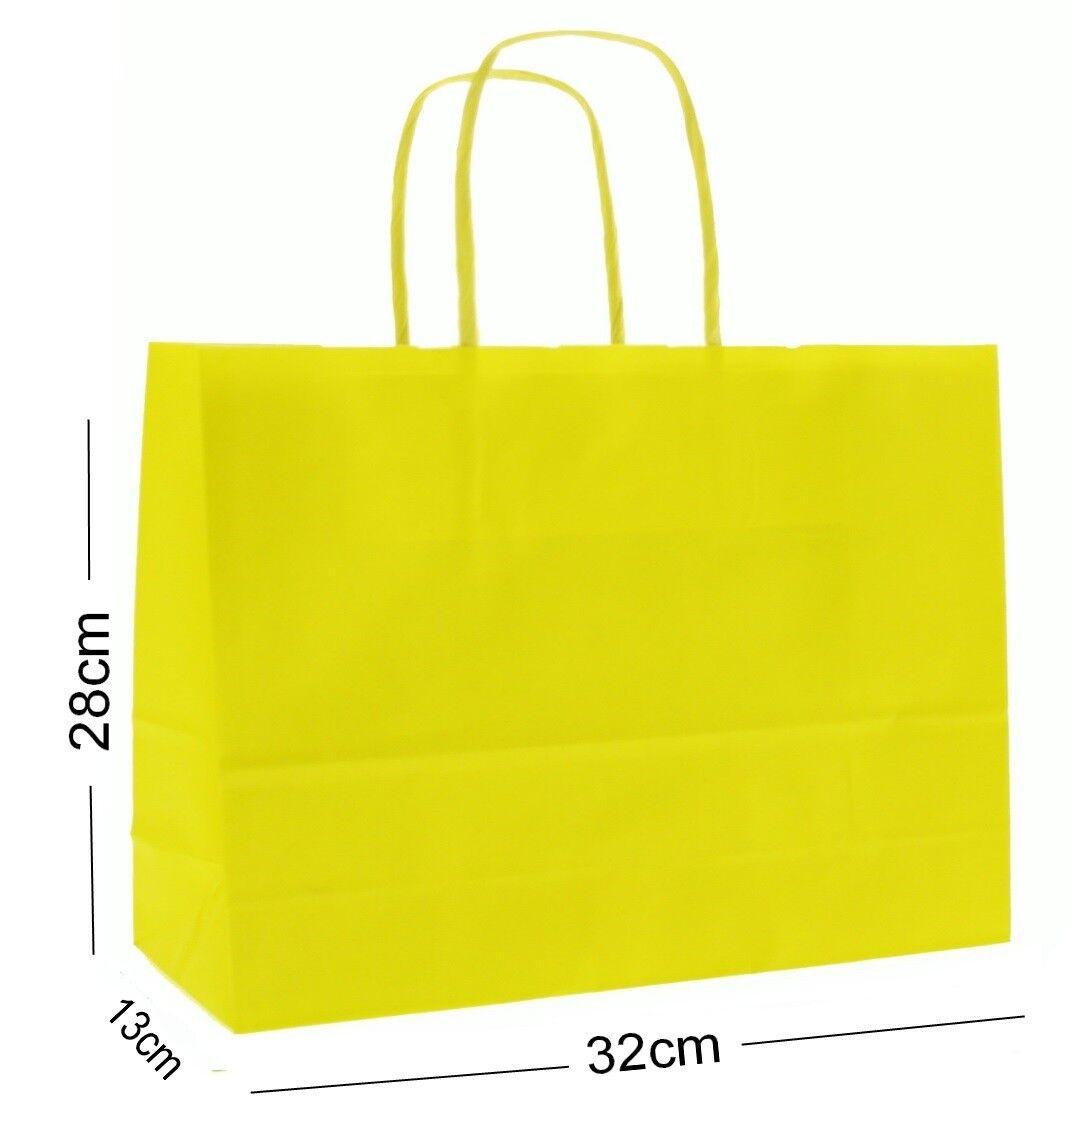 Landschaft Groß Papier Party Geschenktüten  Boutique Geschäft Geschäft Geschäft Tasche  | Angemessener Preis  c1a2f6